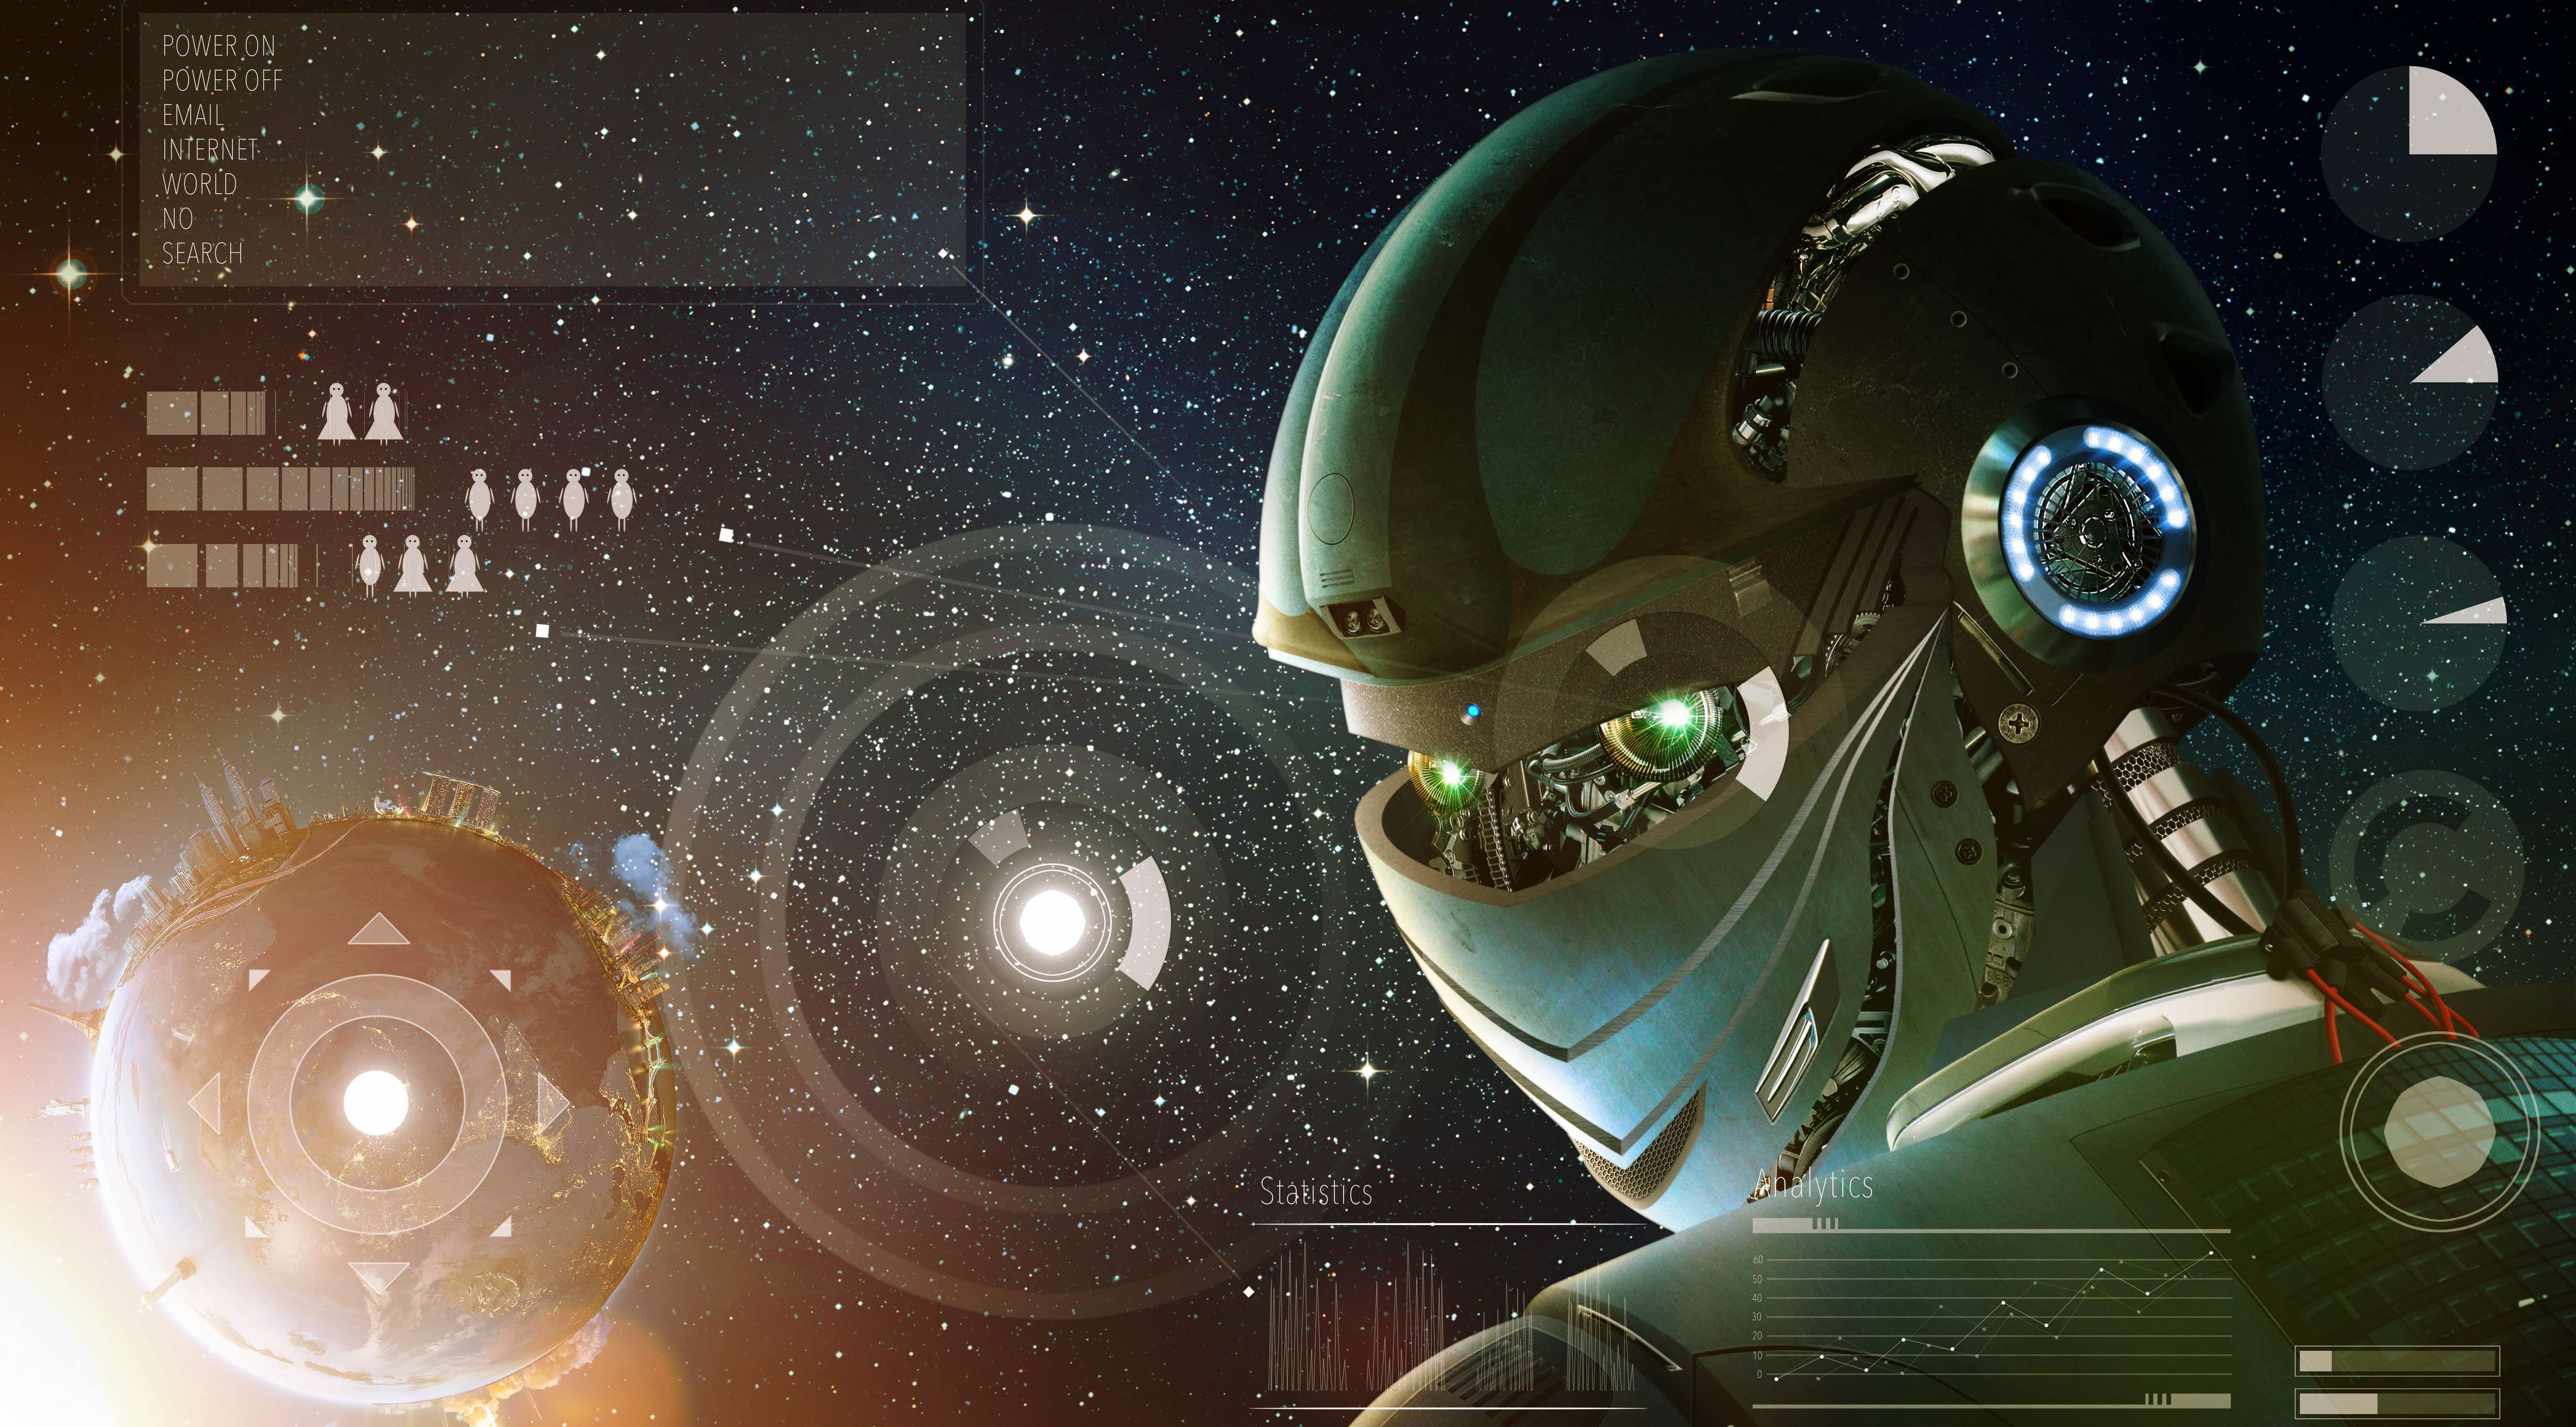 Should we regulate AI?